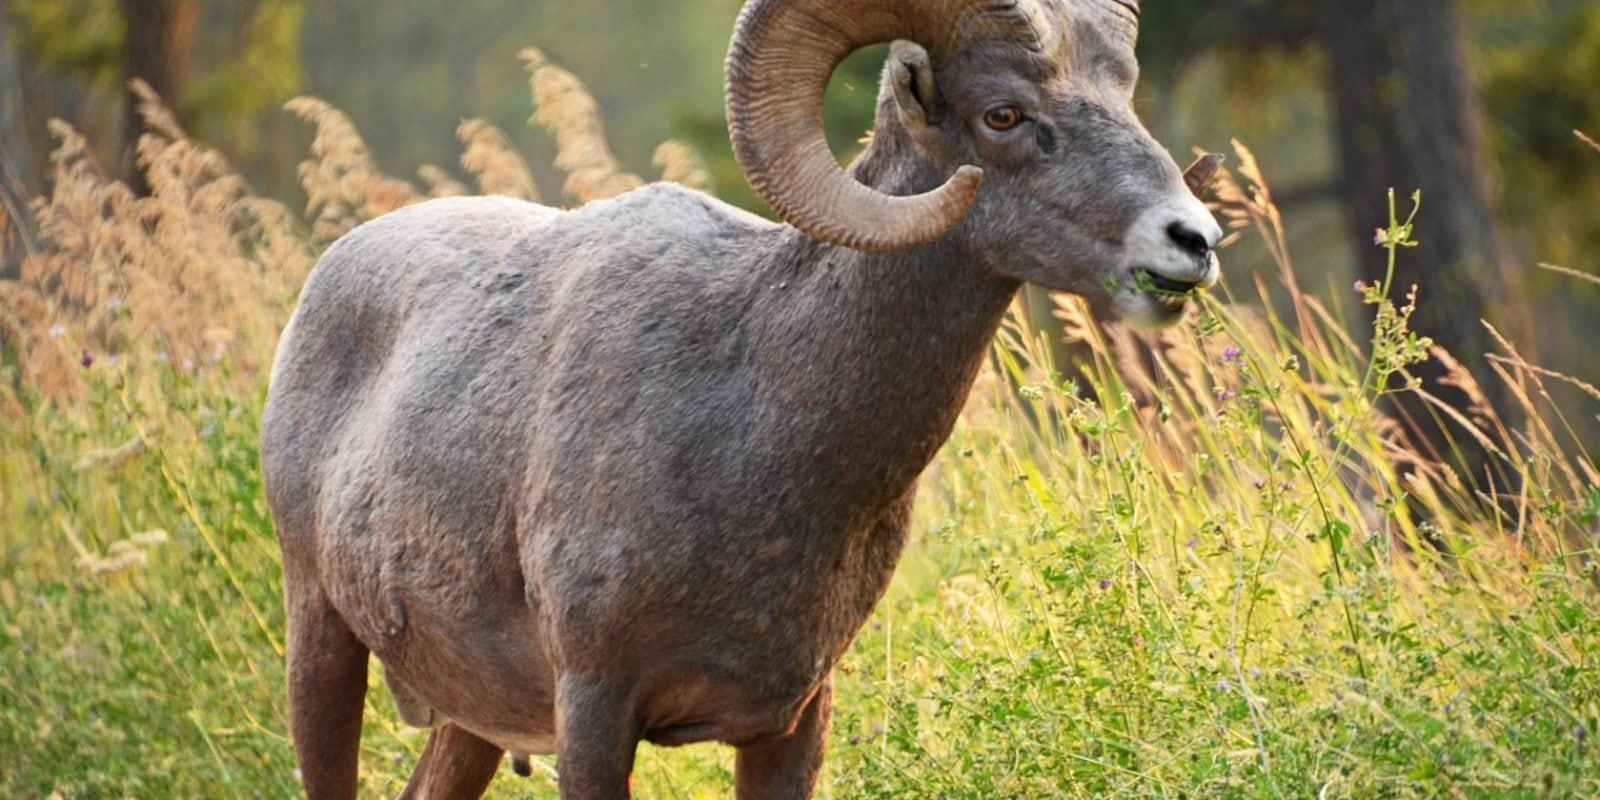 Bighorn-eating-grass-M.-Oliver